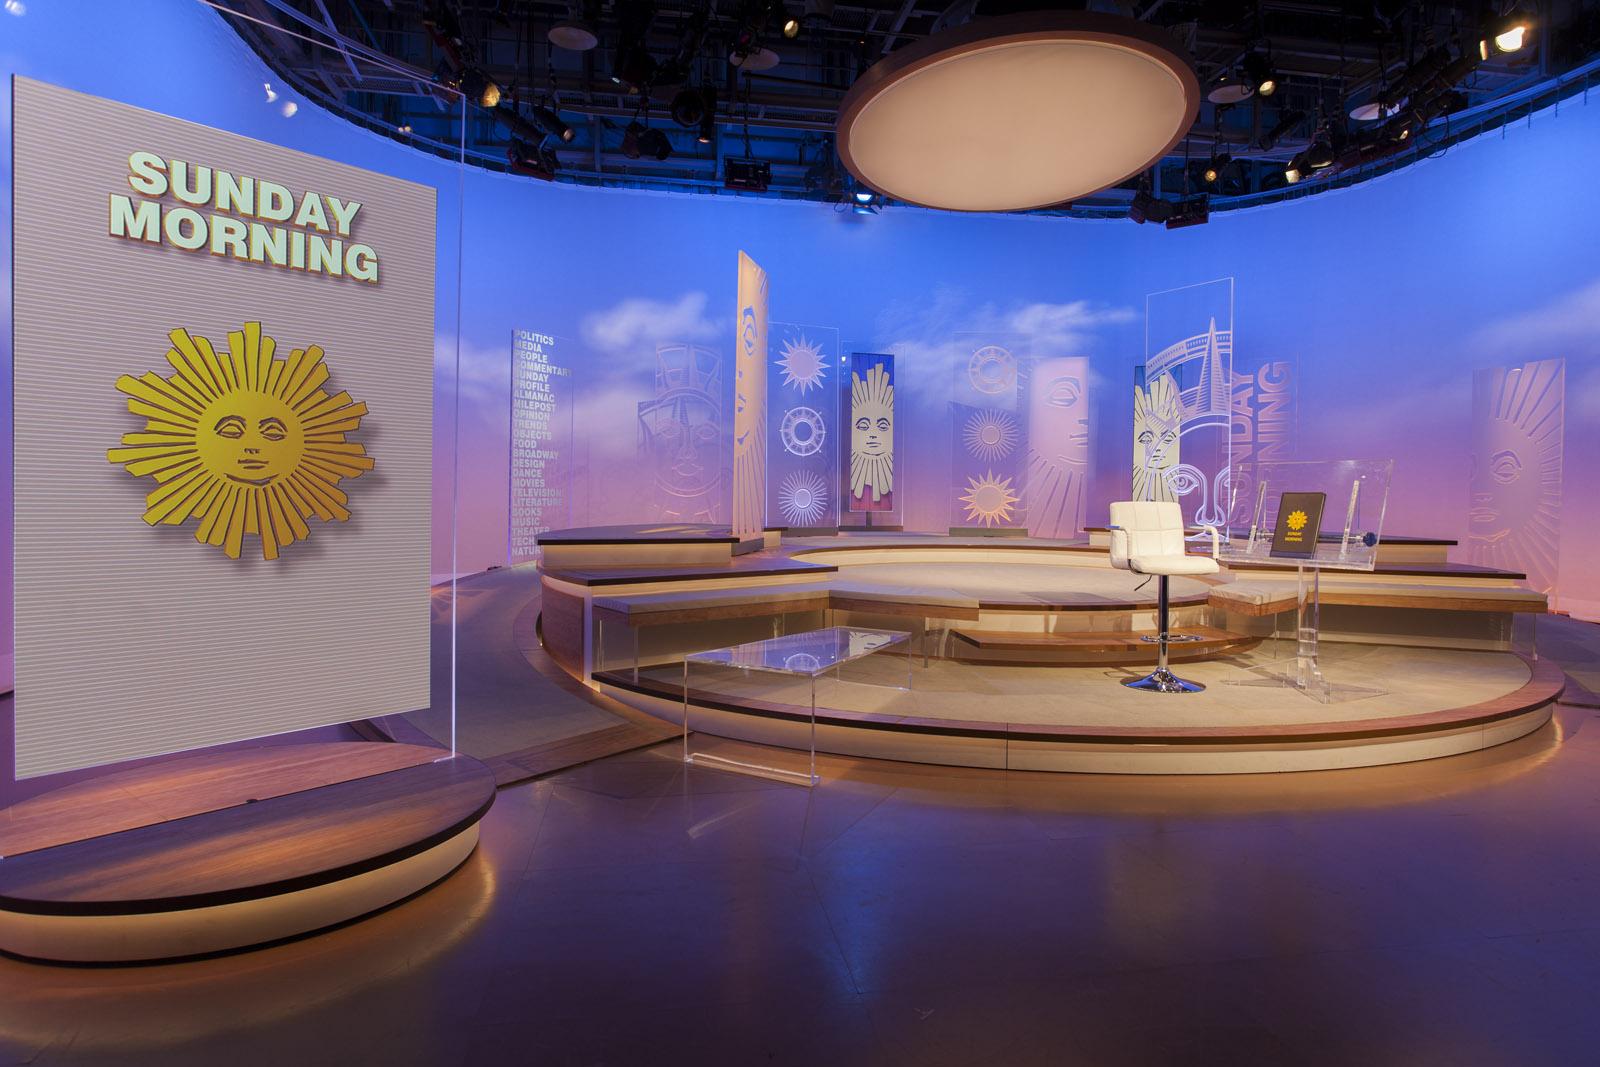 NCS_CBS-Sunday-Morning_0006